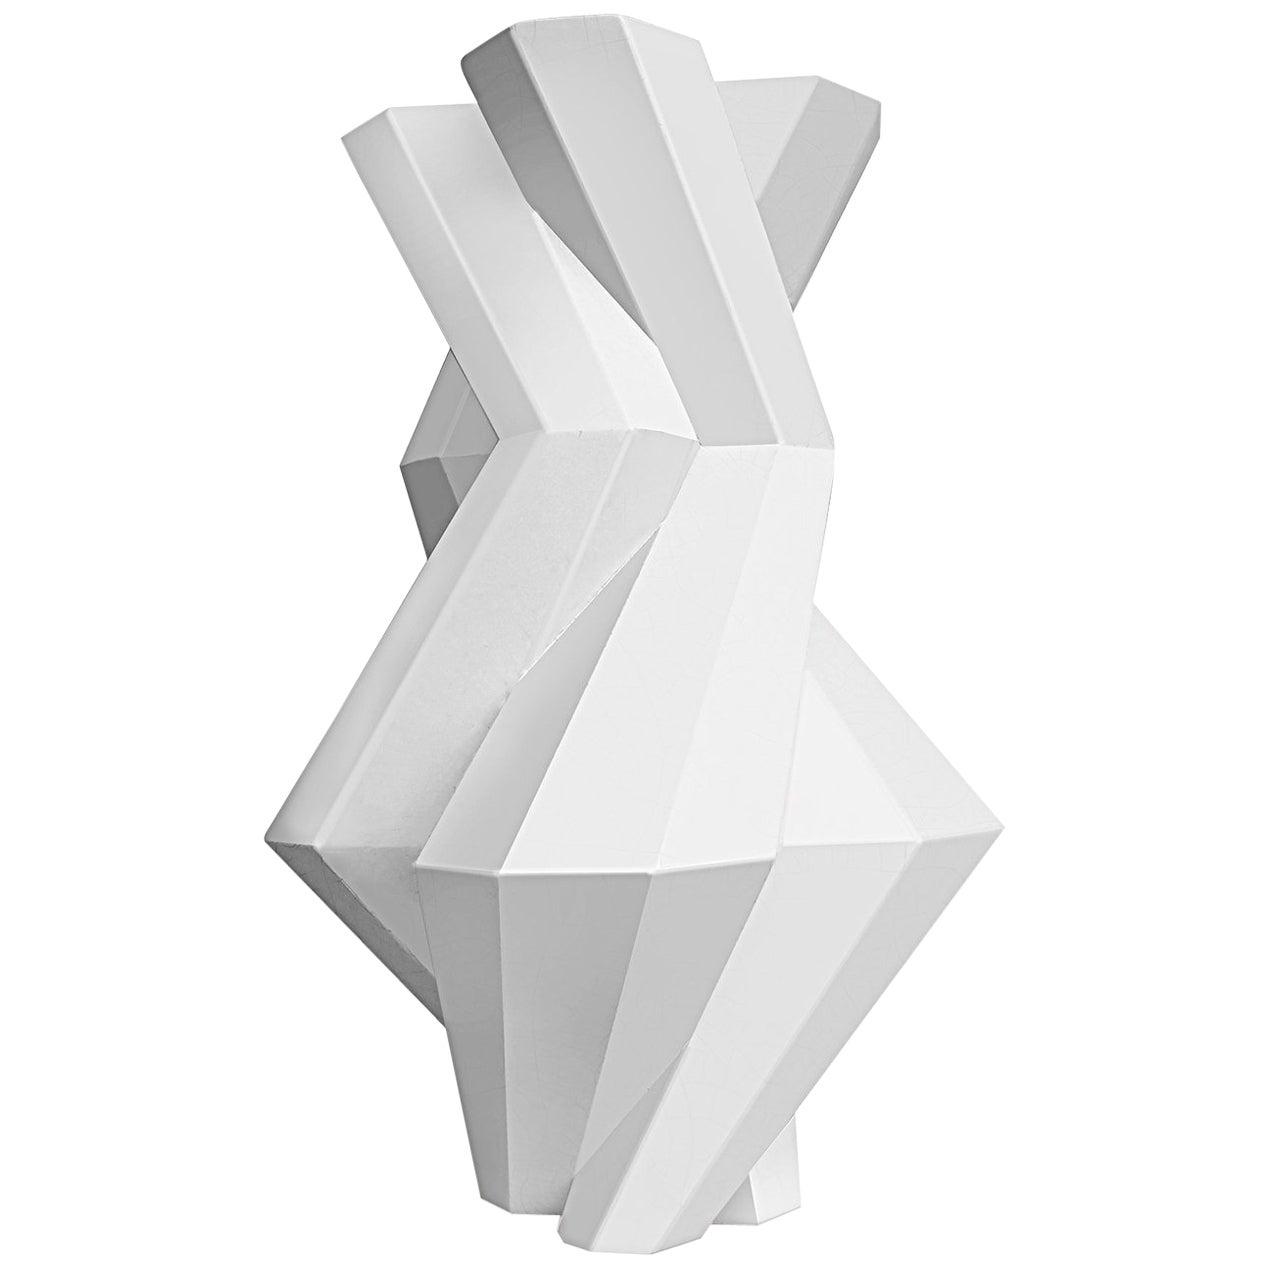 Lara Bohinc, Fortress Castle Vase, White Ceramic by Lara Bohinc